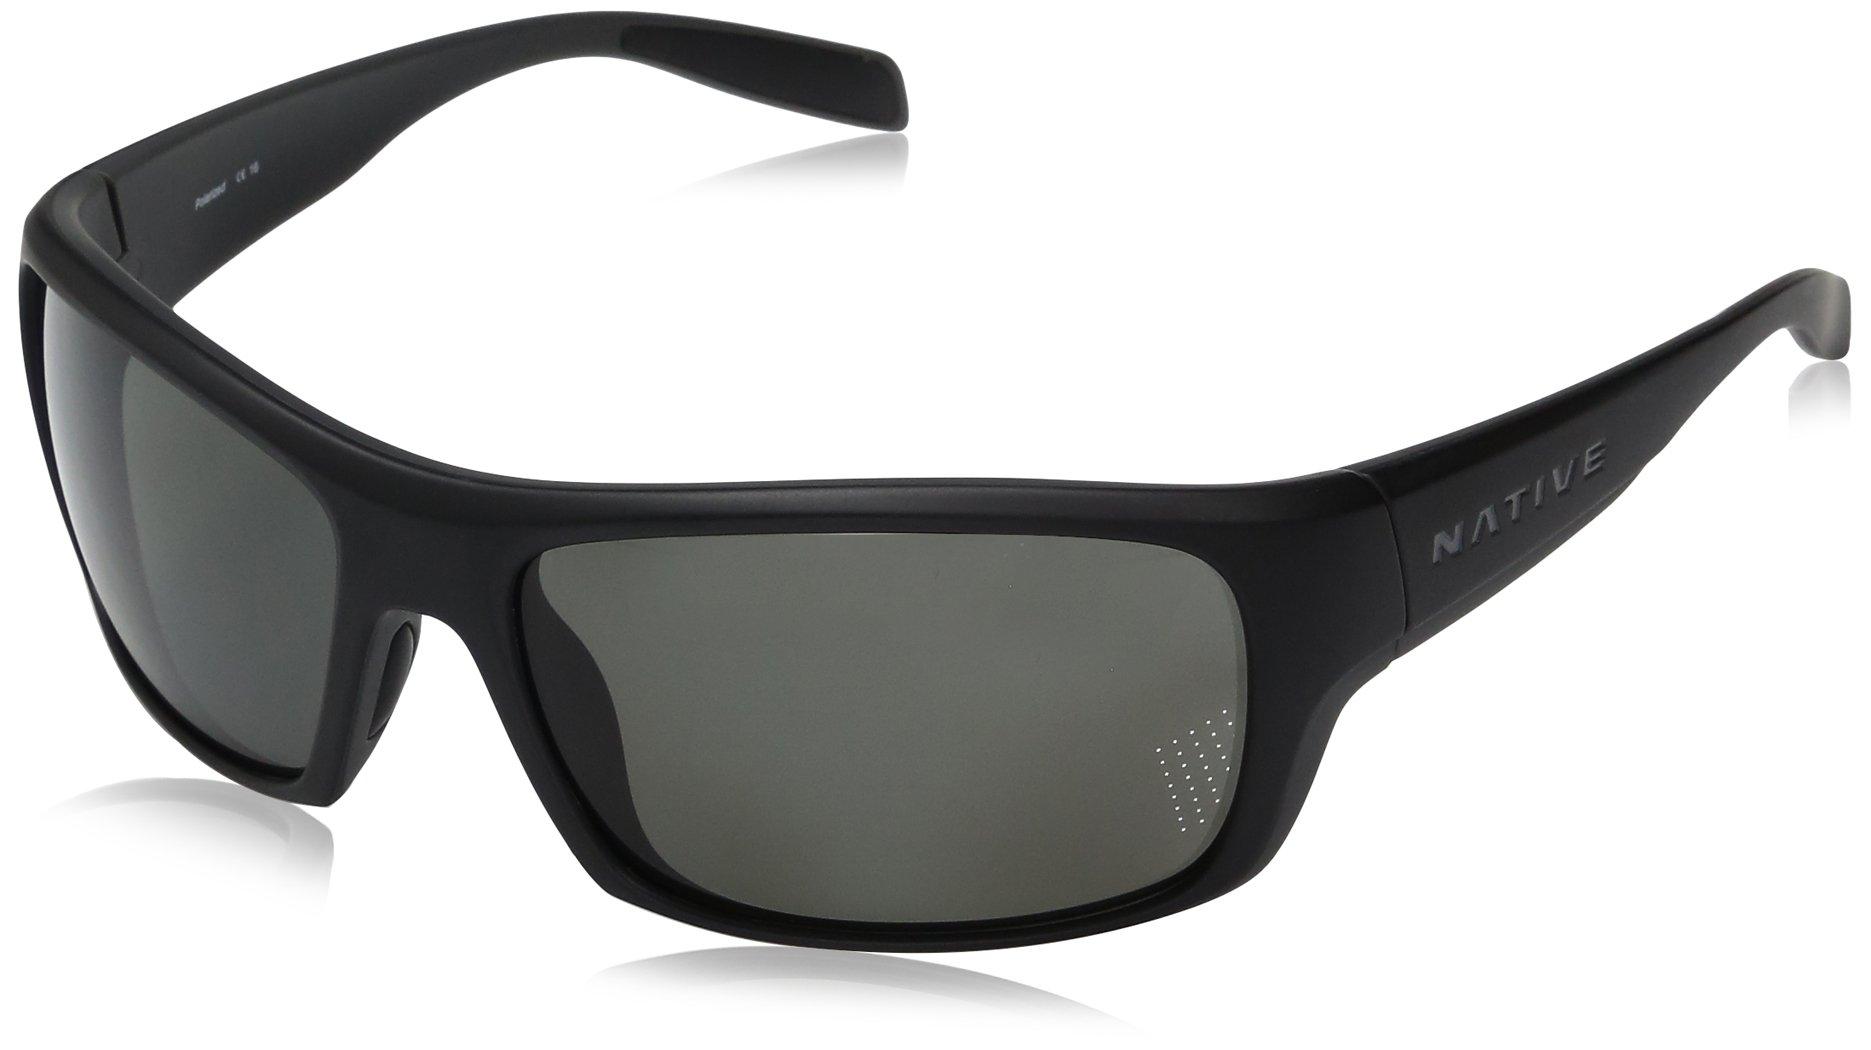 Native Eyewear Eddyline Sport Sunglasses